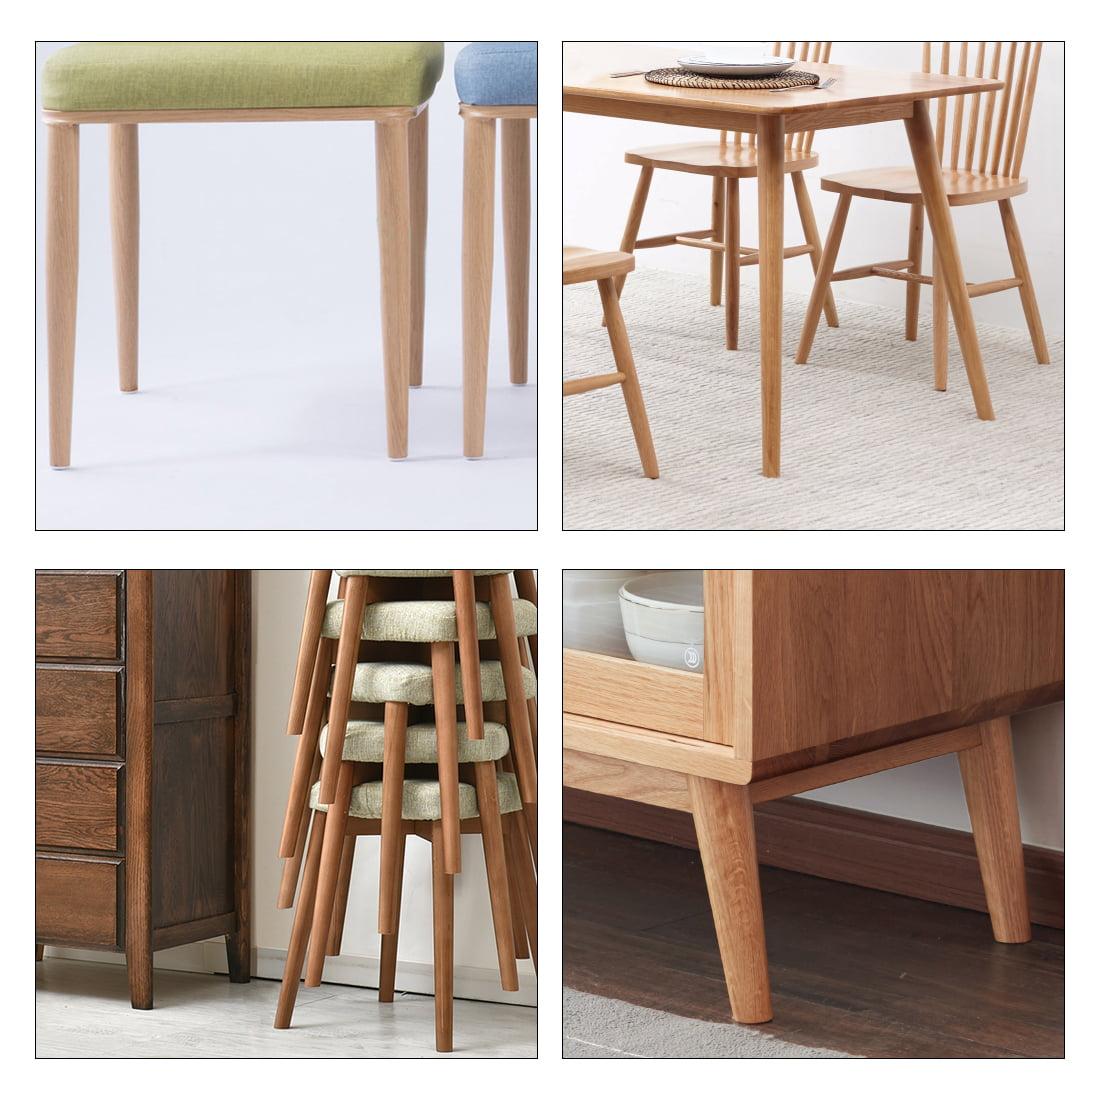 Chair Table Leg Protector Pad 22mm Dia White Plastic 40pcs Furniture Feet Nail